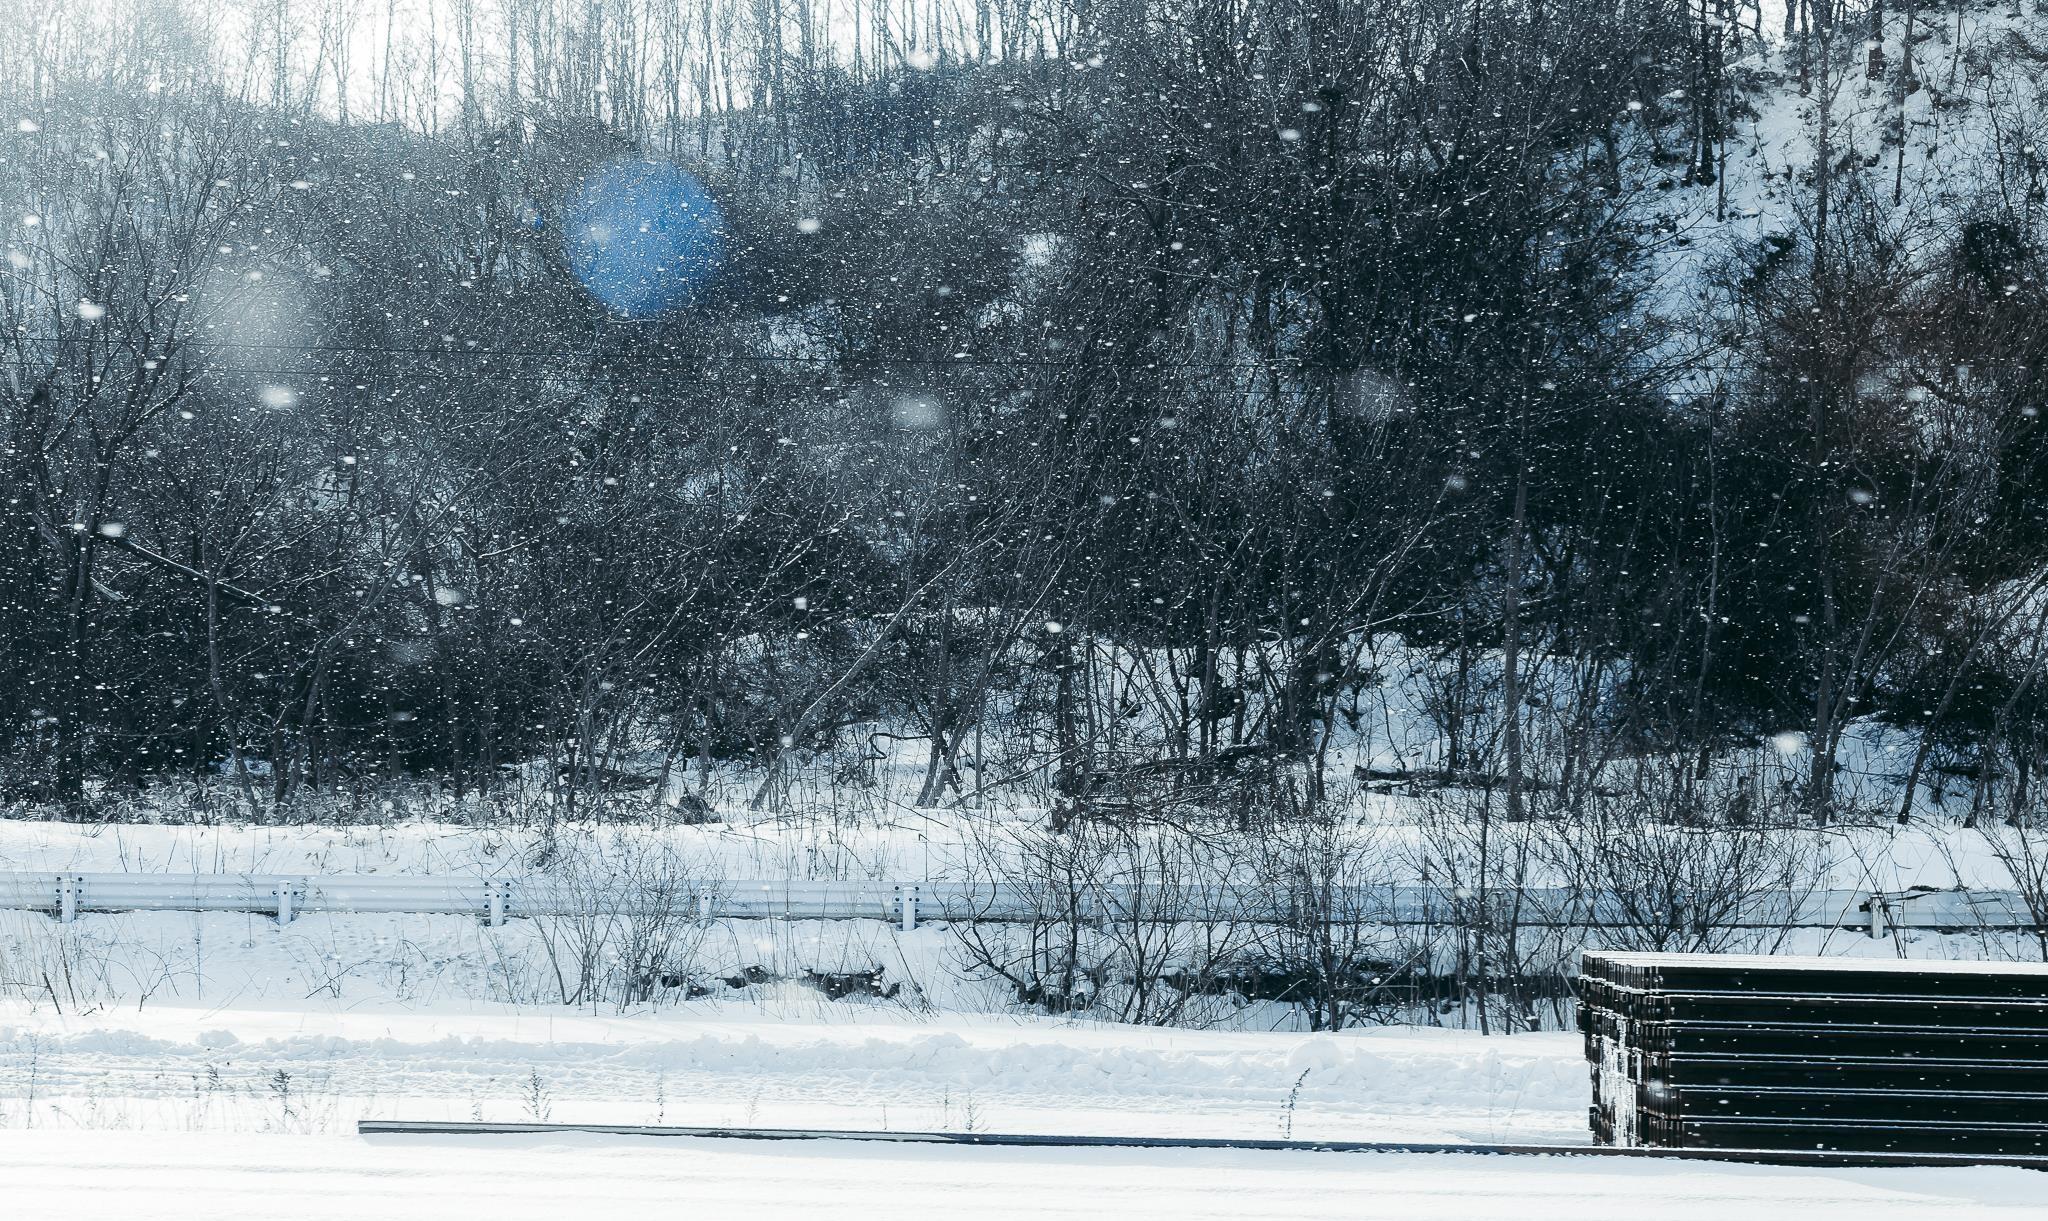 Hokkaido tuyet trang, noi dang den nhat mua dong o Nhat Ban hinh anh 13